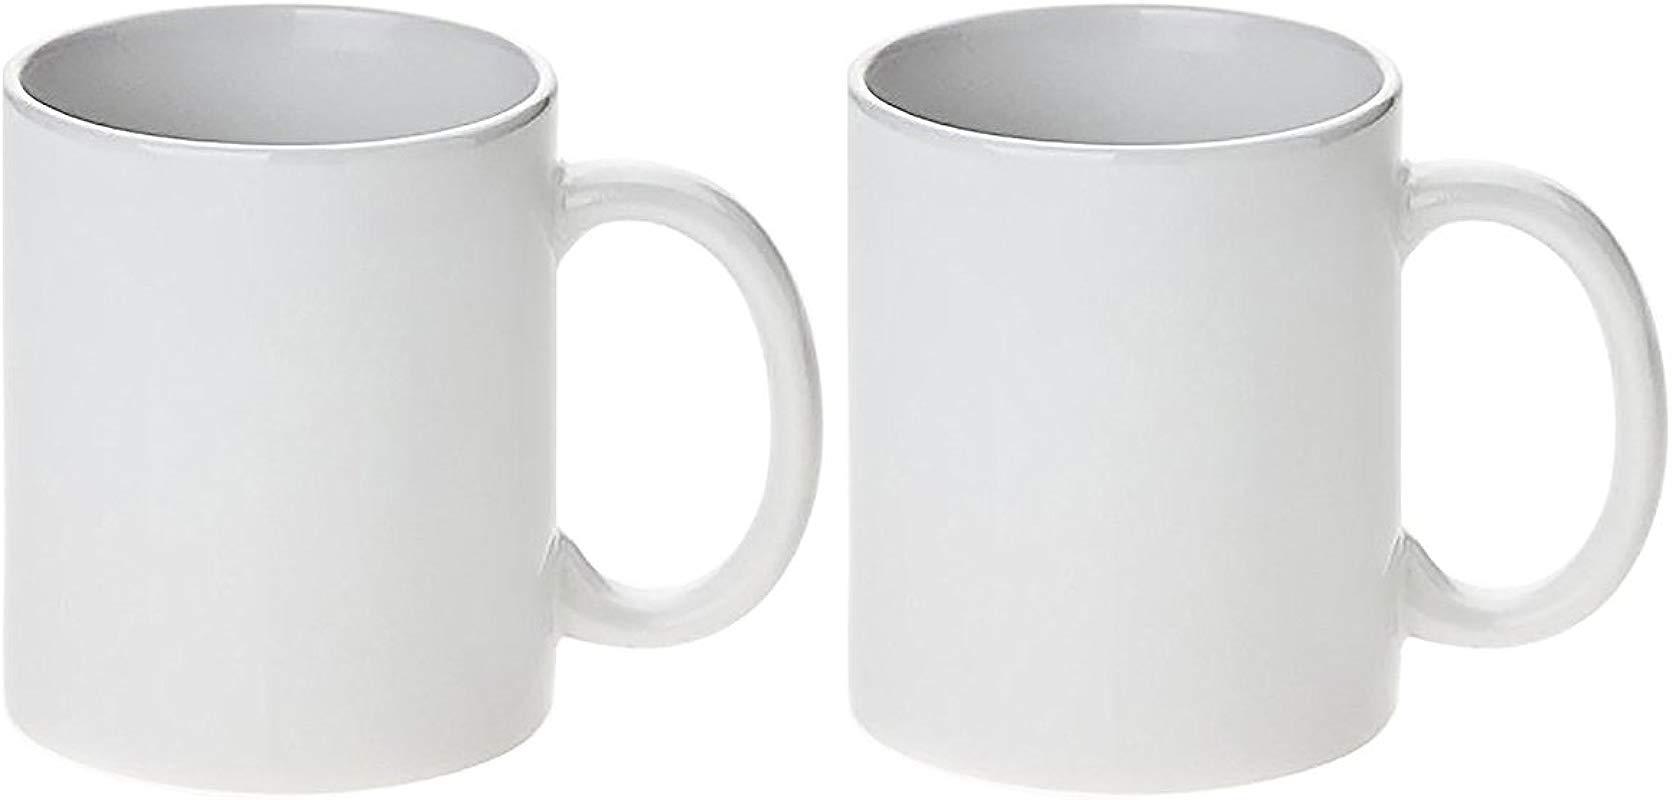 White Ceramic Sublimation Coffee Mug 11oz 2 Pack